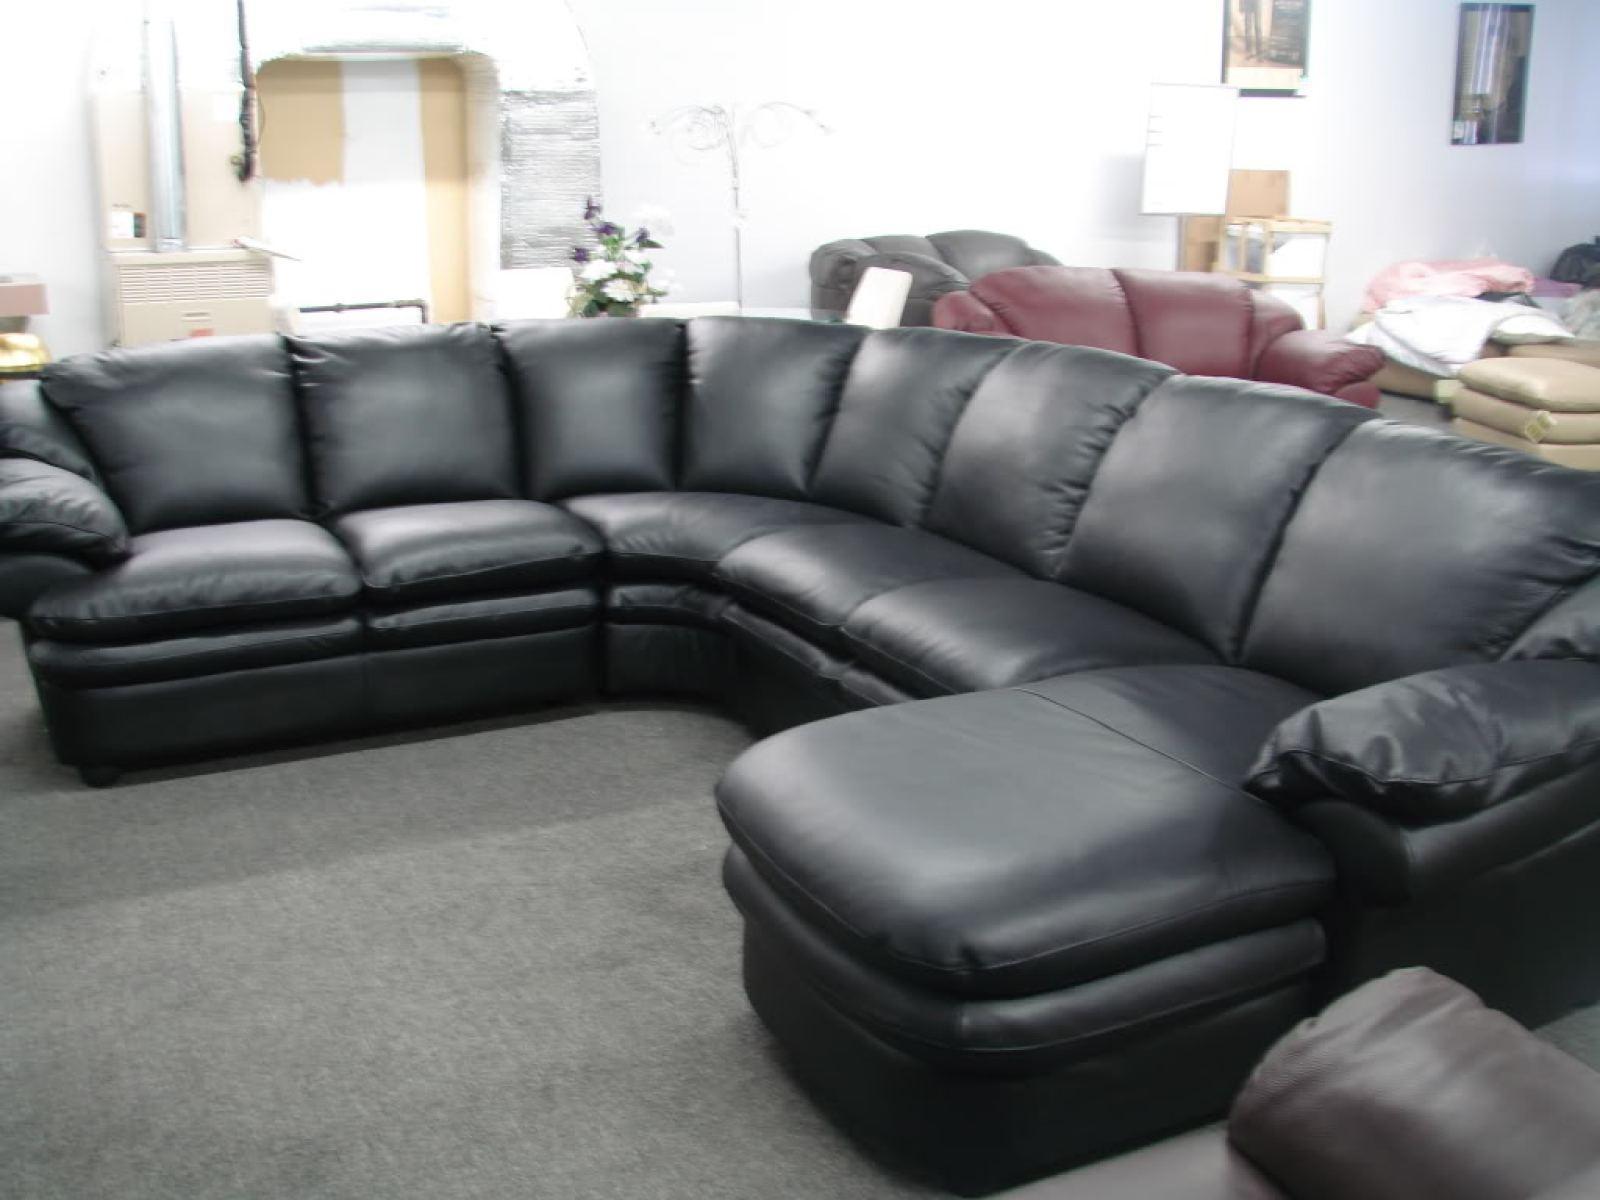 ▻ Sofa : 23 Fascinating Leather Sofa Bed Wonderful Sofa Beds Throughout Leather Sofa Beds With Storage (Image 1 of 20)